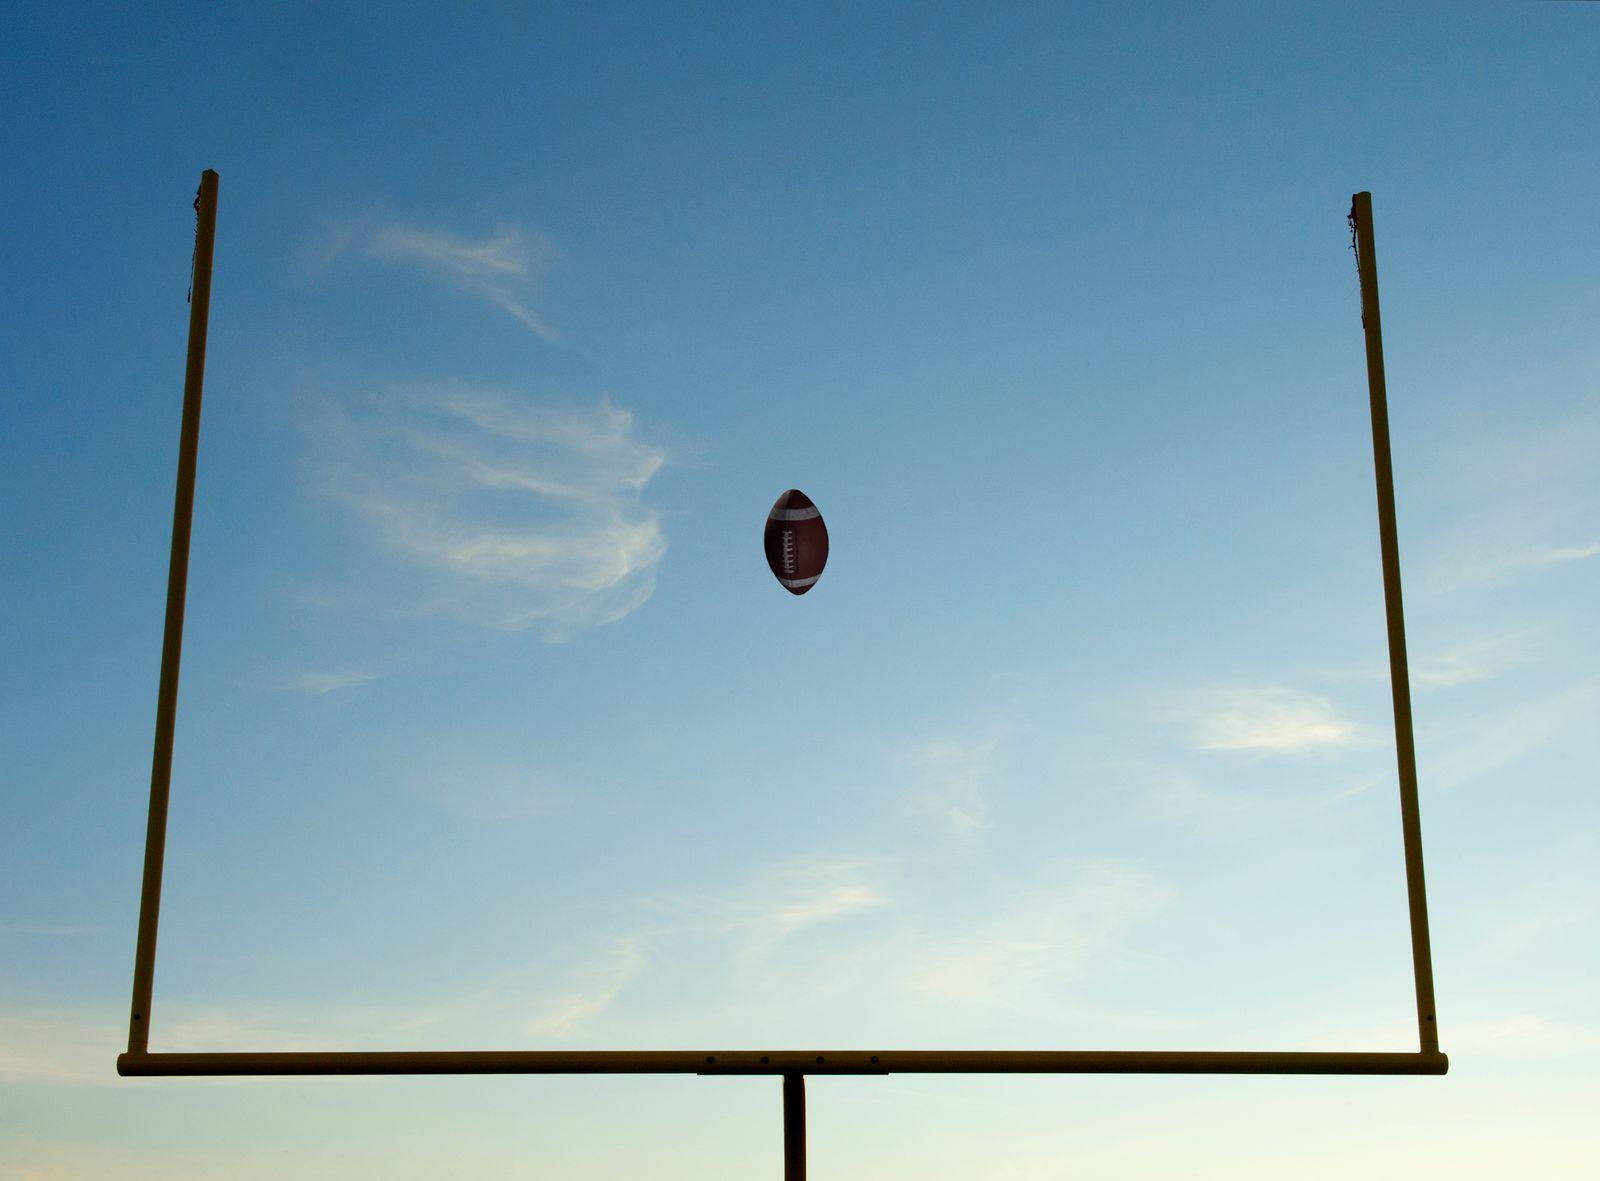 Football being thrown through goal posts